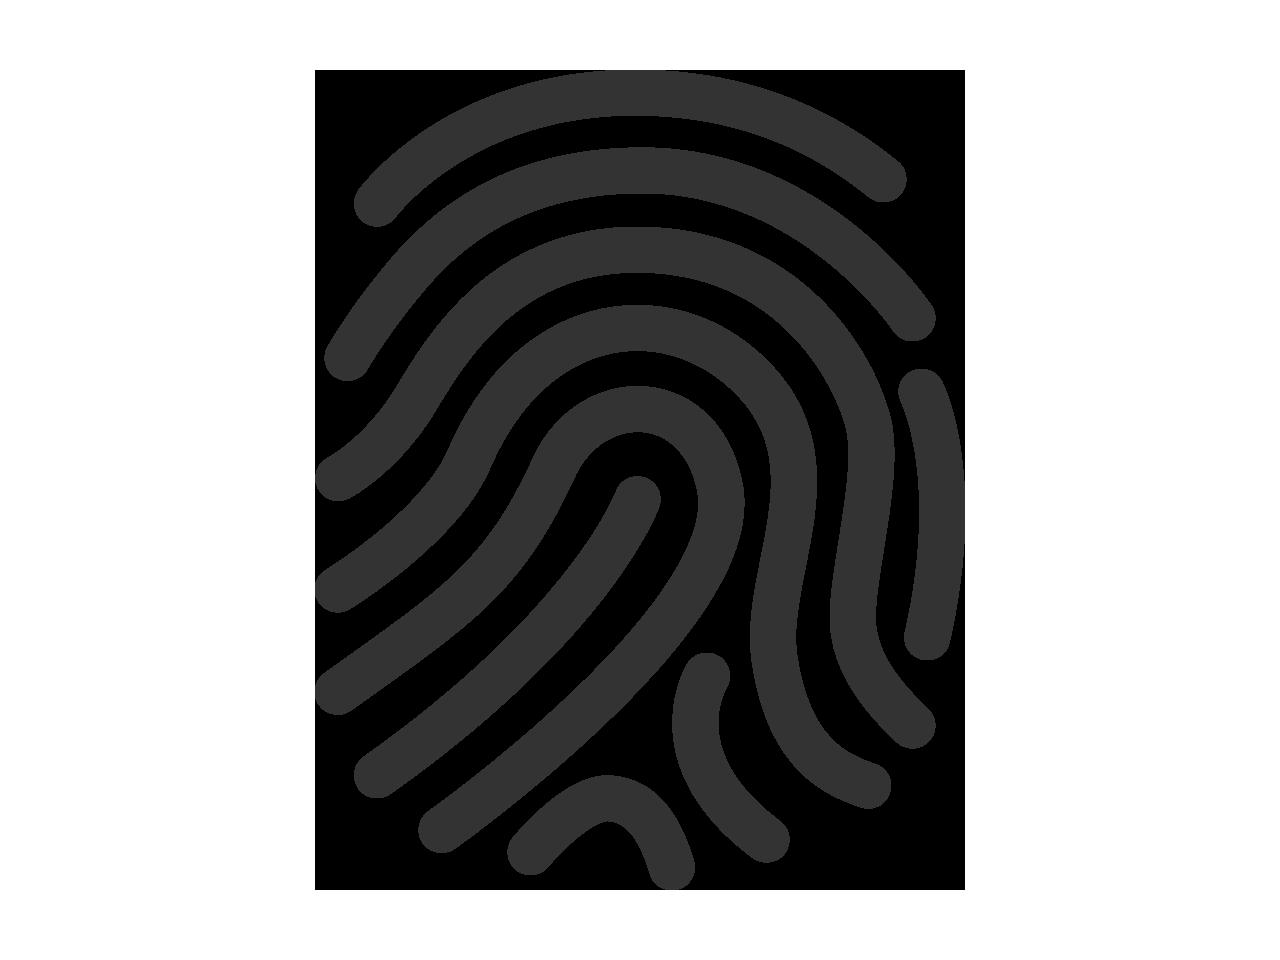 Fingerprint icon (PSD) | PSDGraphics